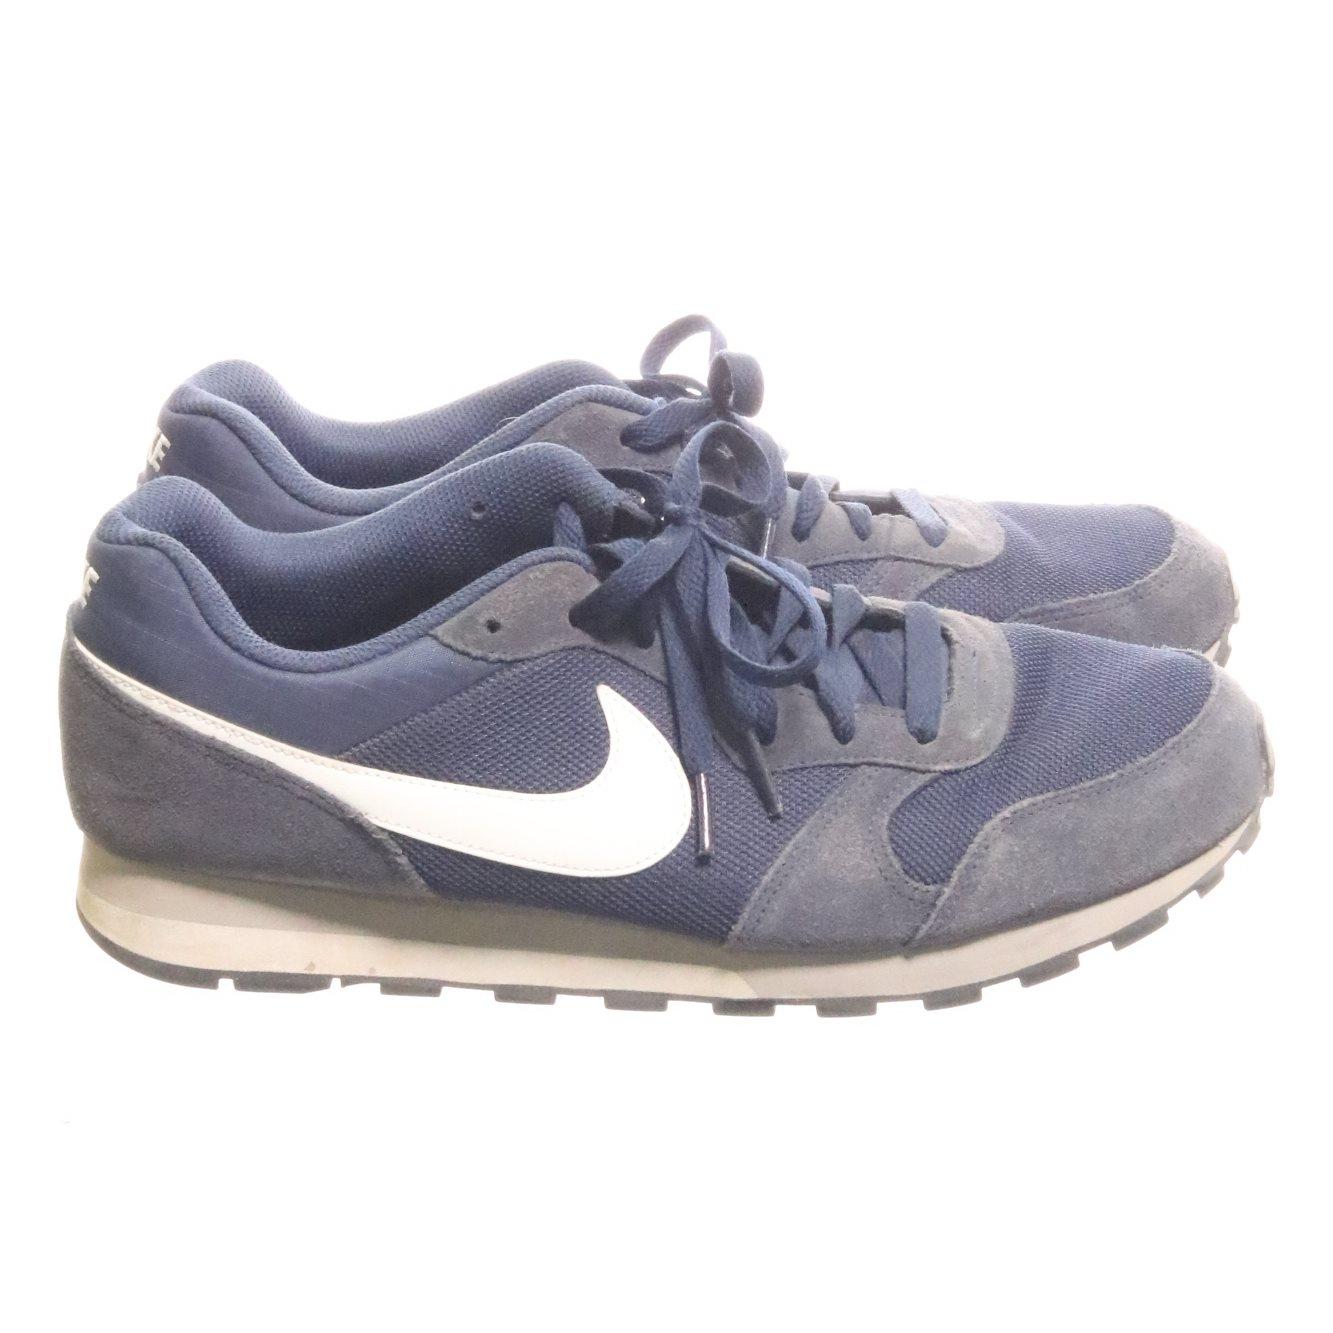 big sale cf092 4da1f Nike, Sneakers, Strl  44.5, MD Runner 2, Blå Vit